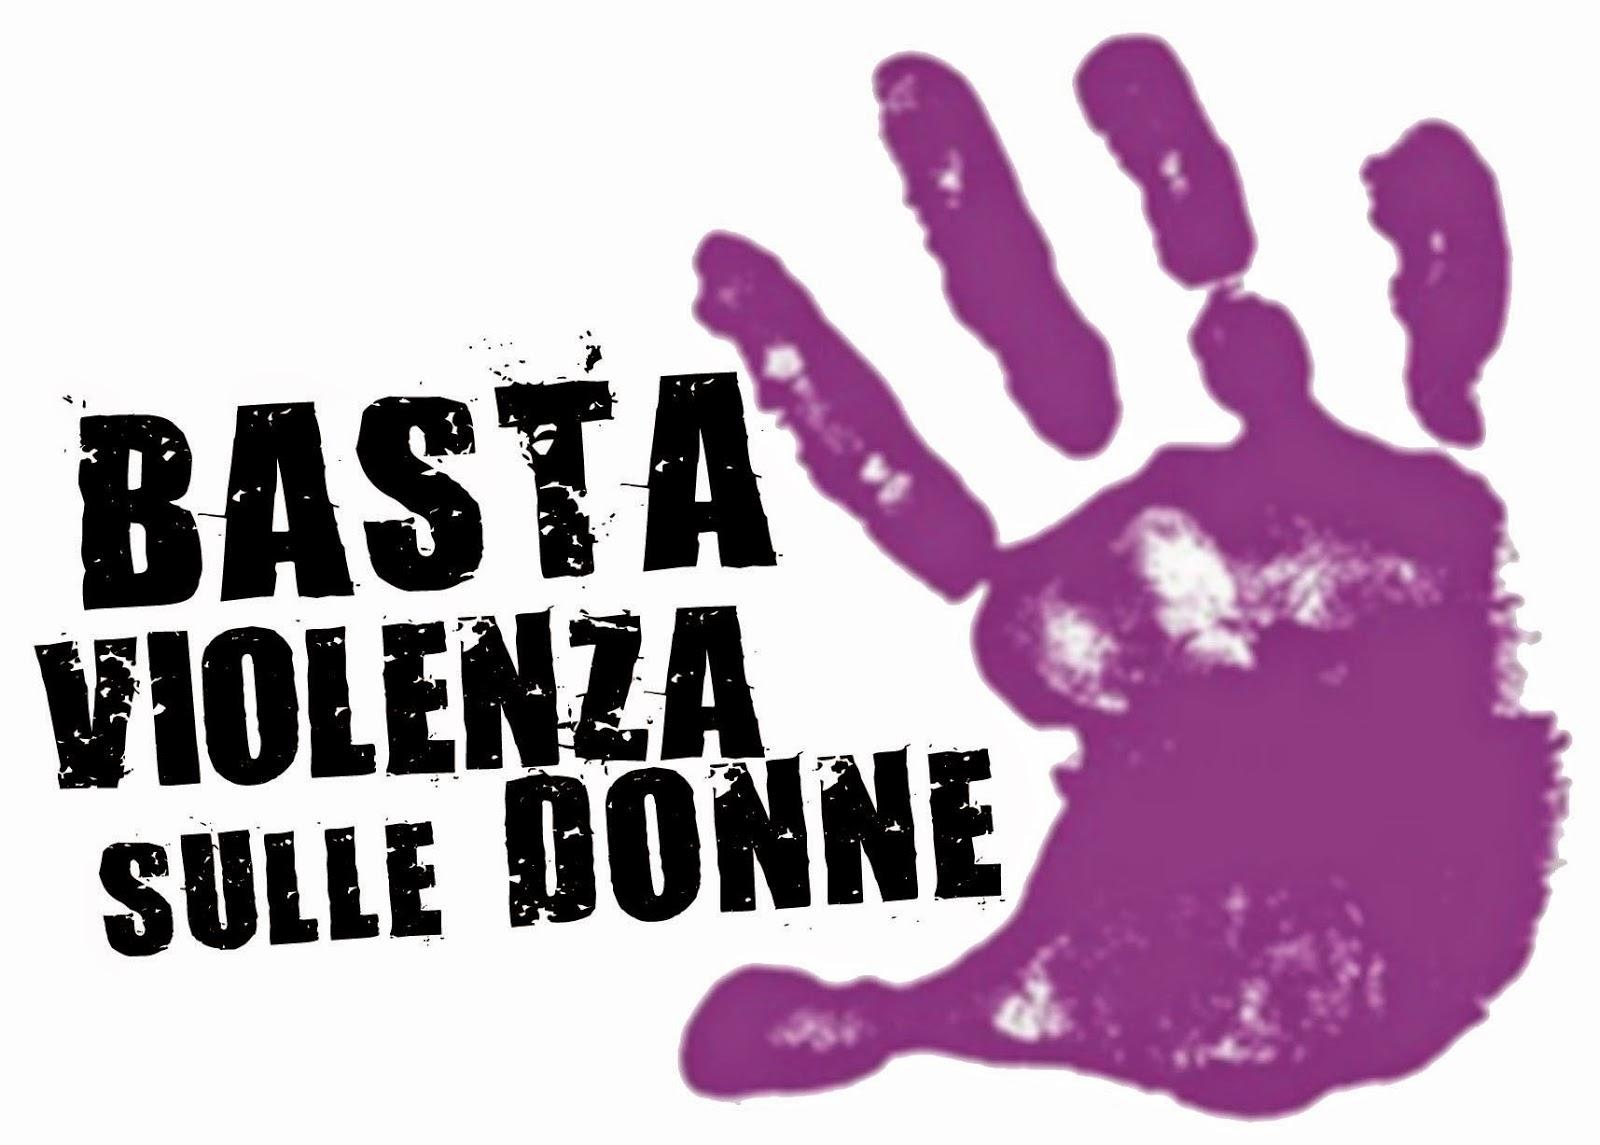 Noi, contro la violenza sulle donne